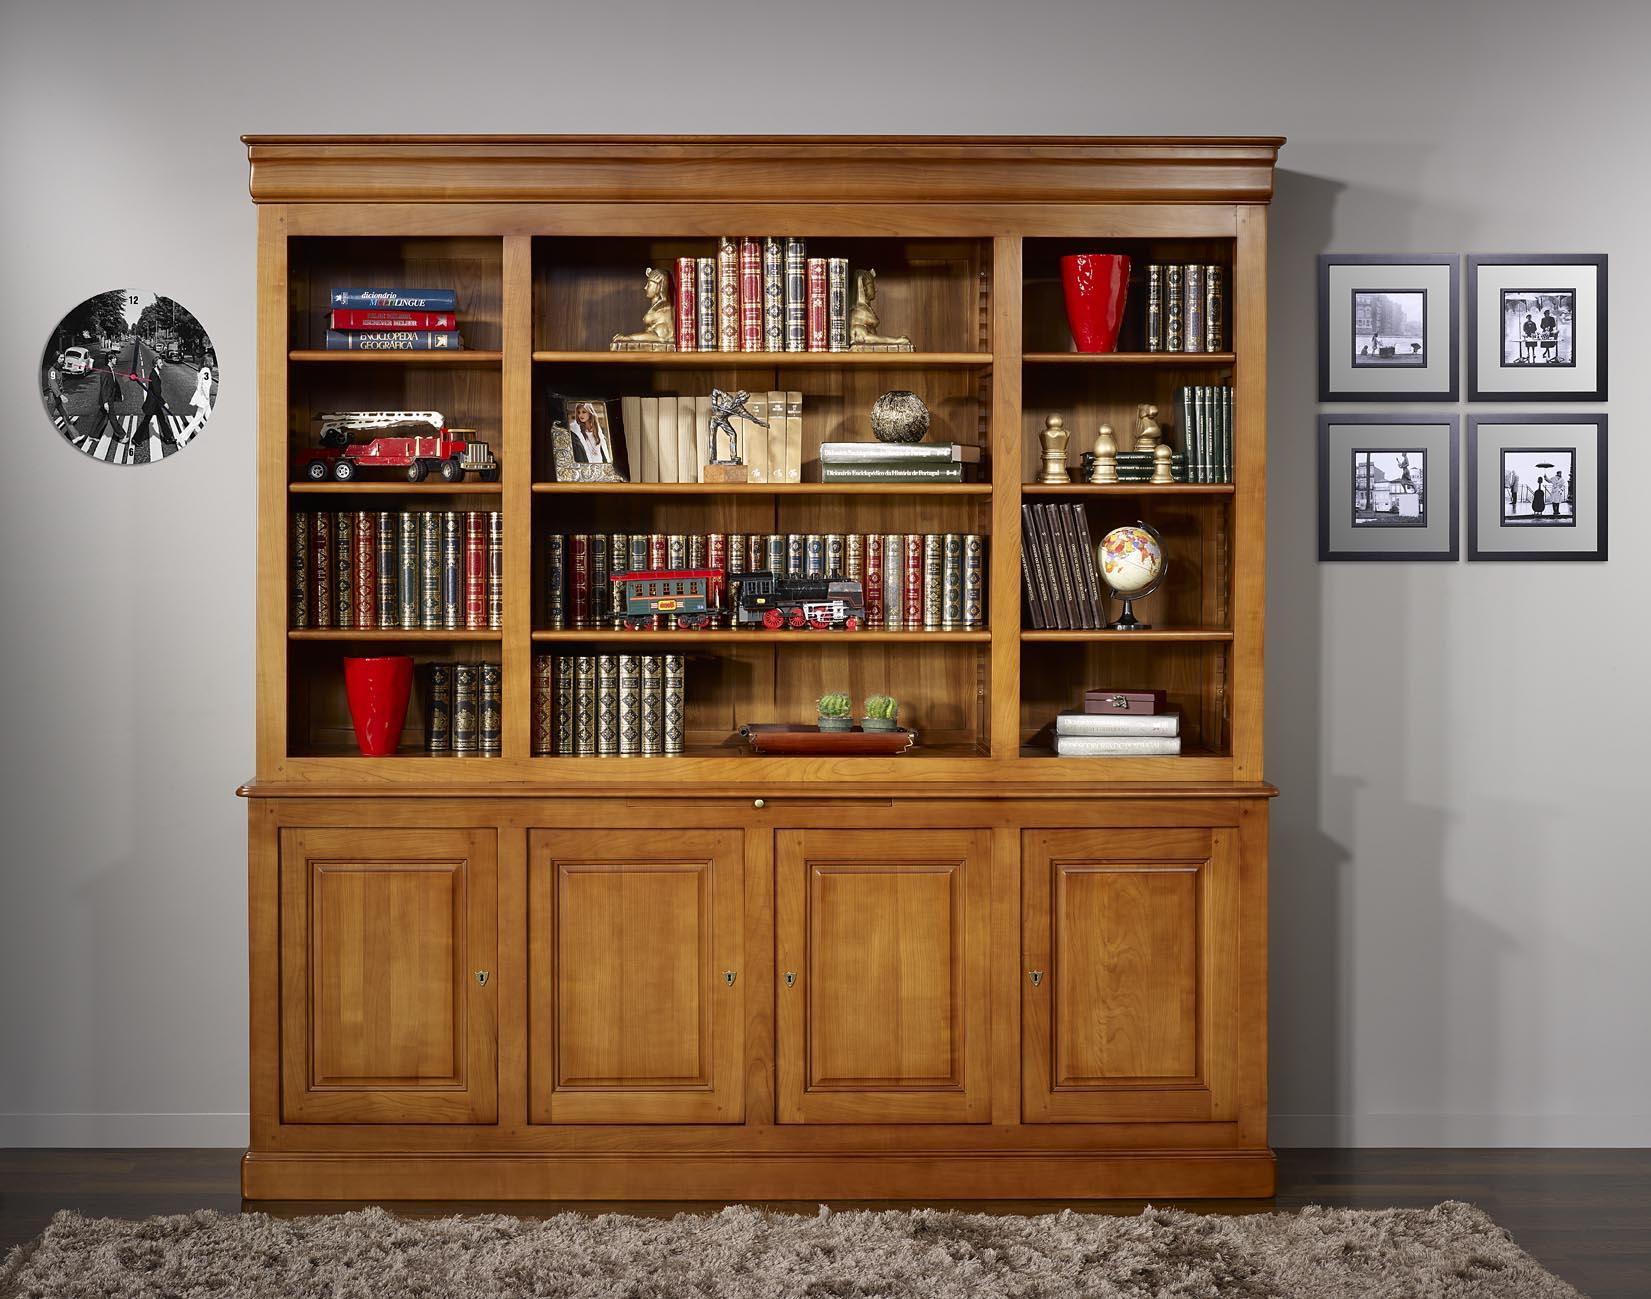 biblioth que 2 corps en merisier massif de style louis philippe meuble en merisier massif. Black Bedroom Furniture Sets. Home Design Ideas